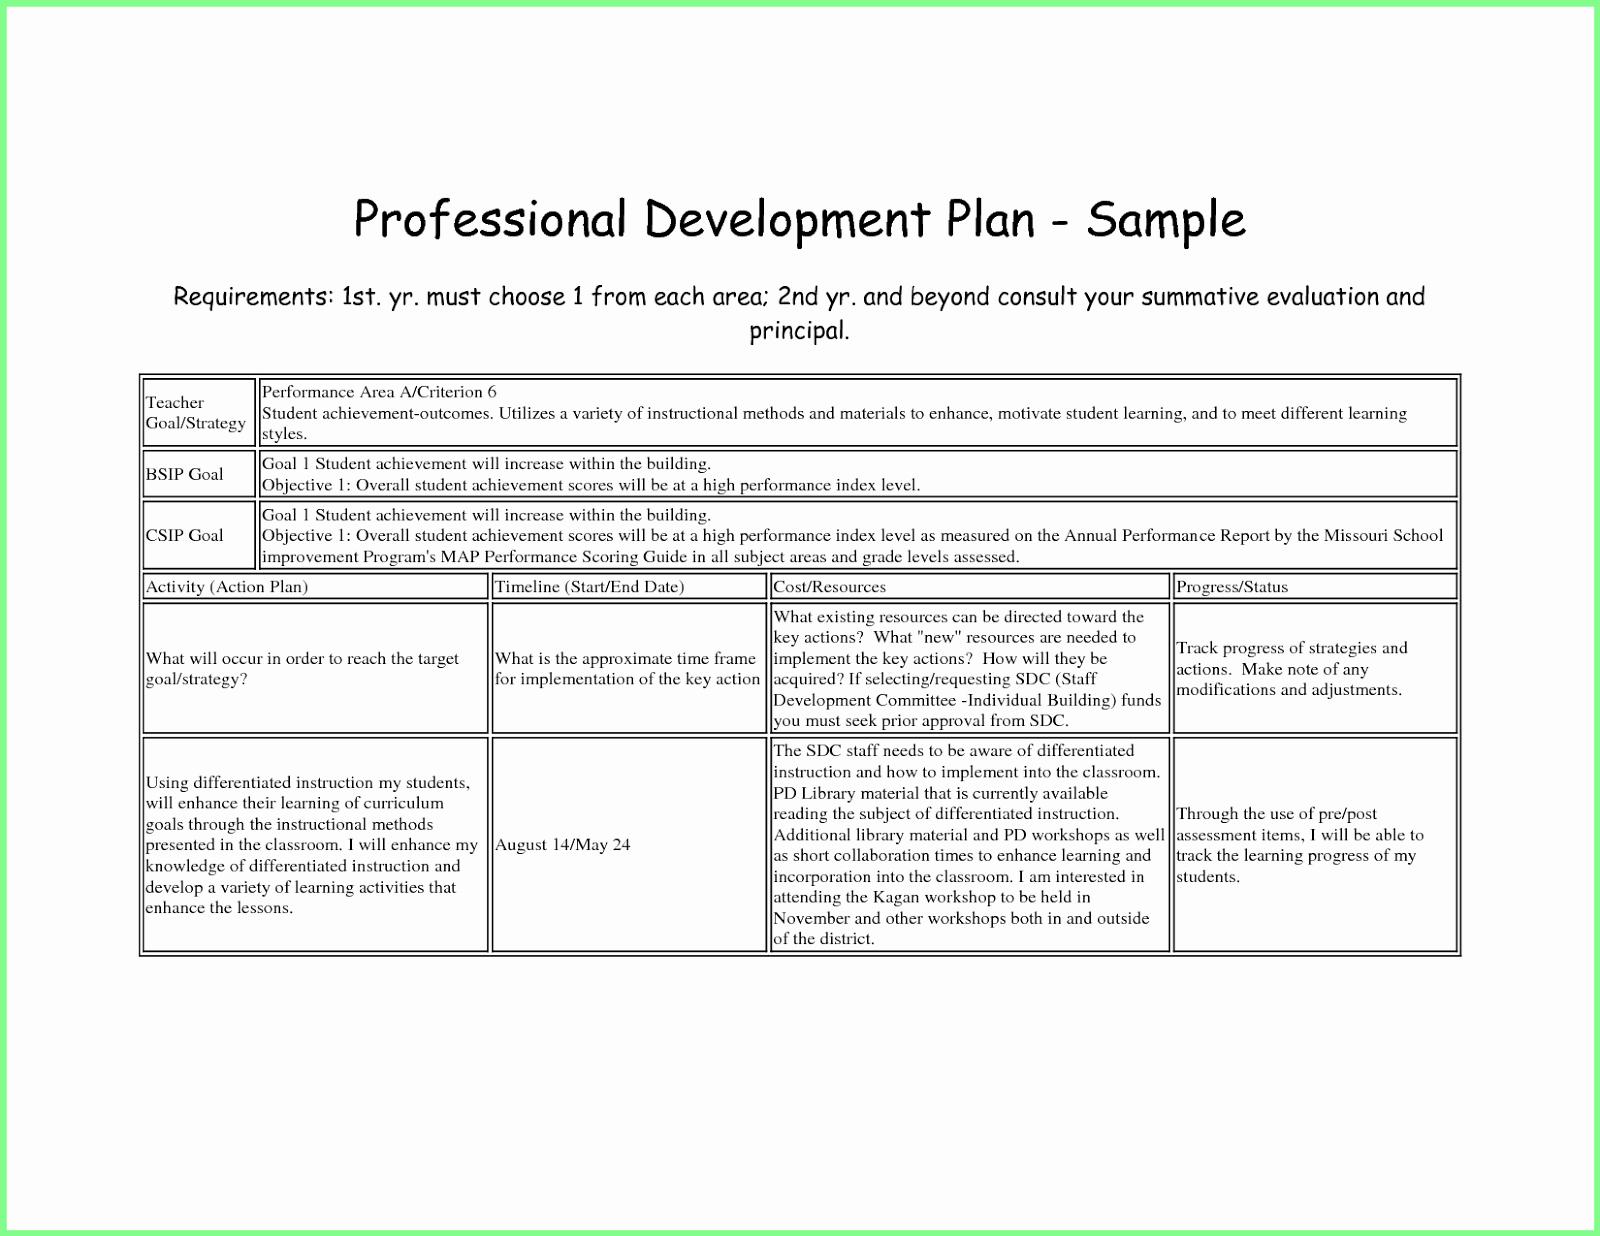 Individual Professional Development Plan Samples New Image Result for Professional Development Plan